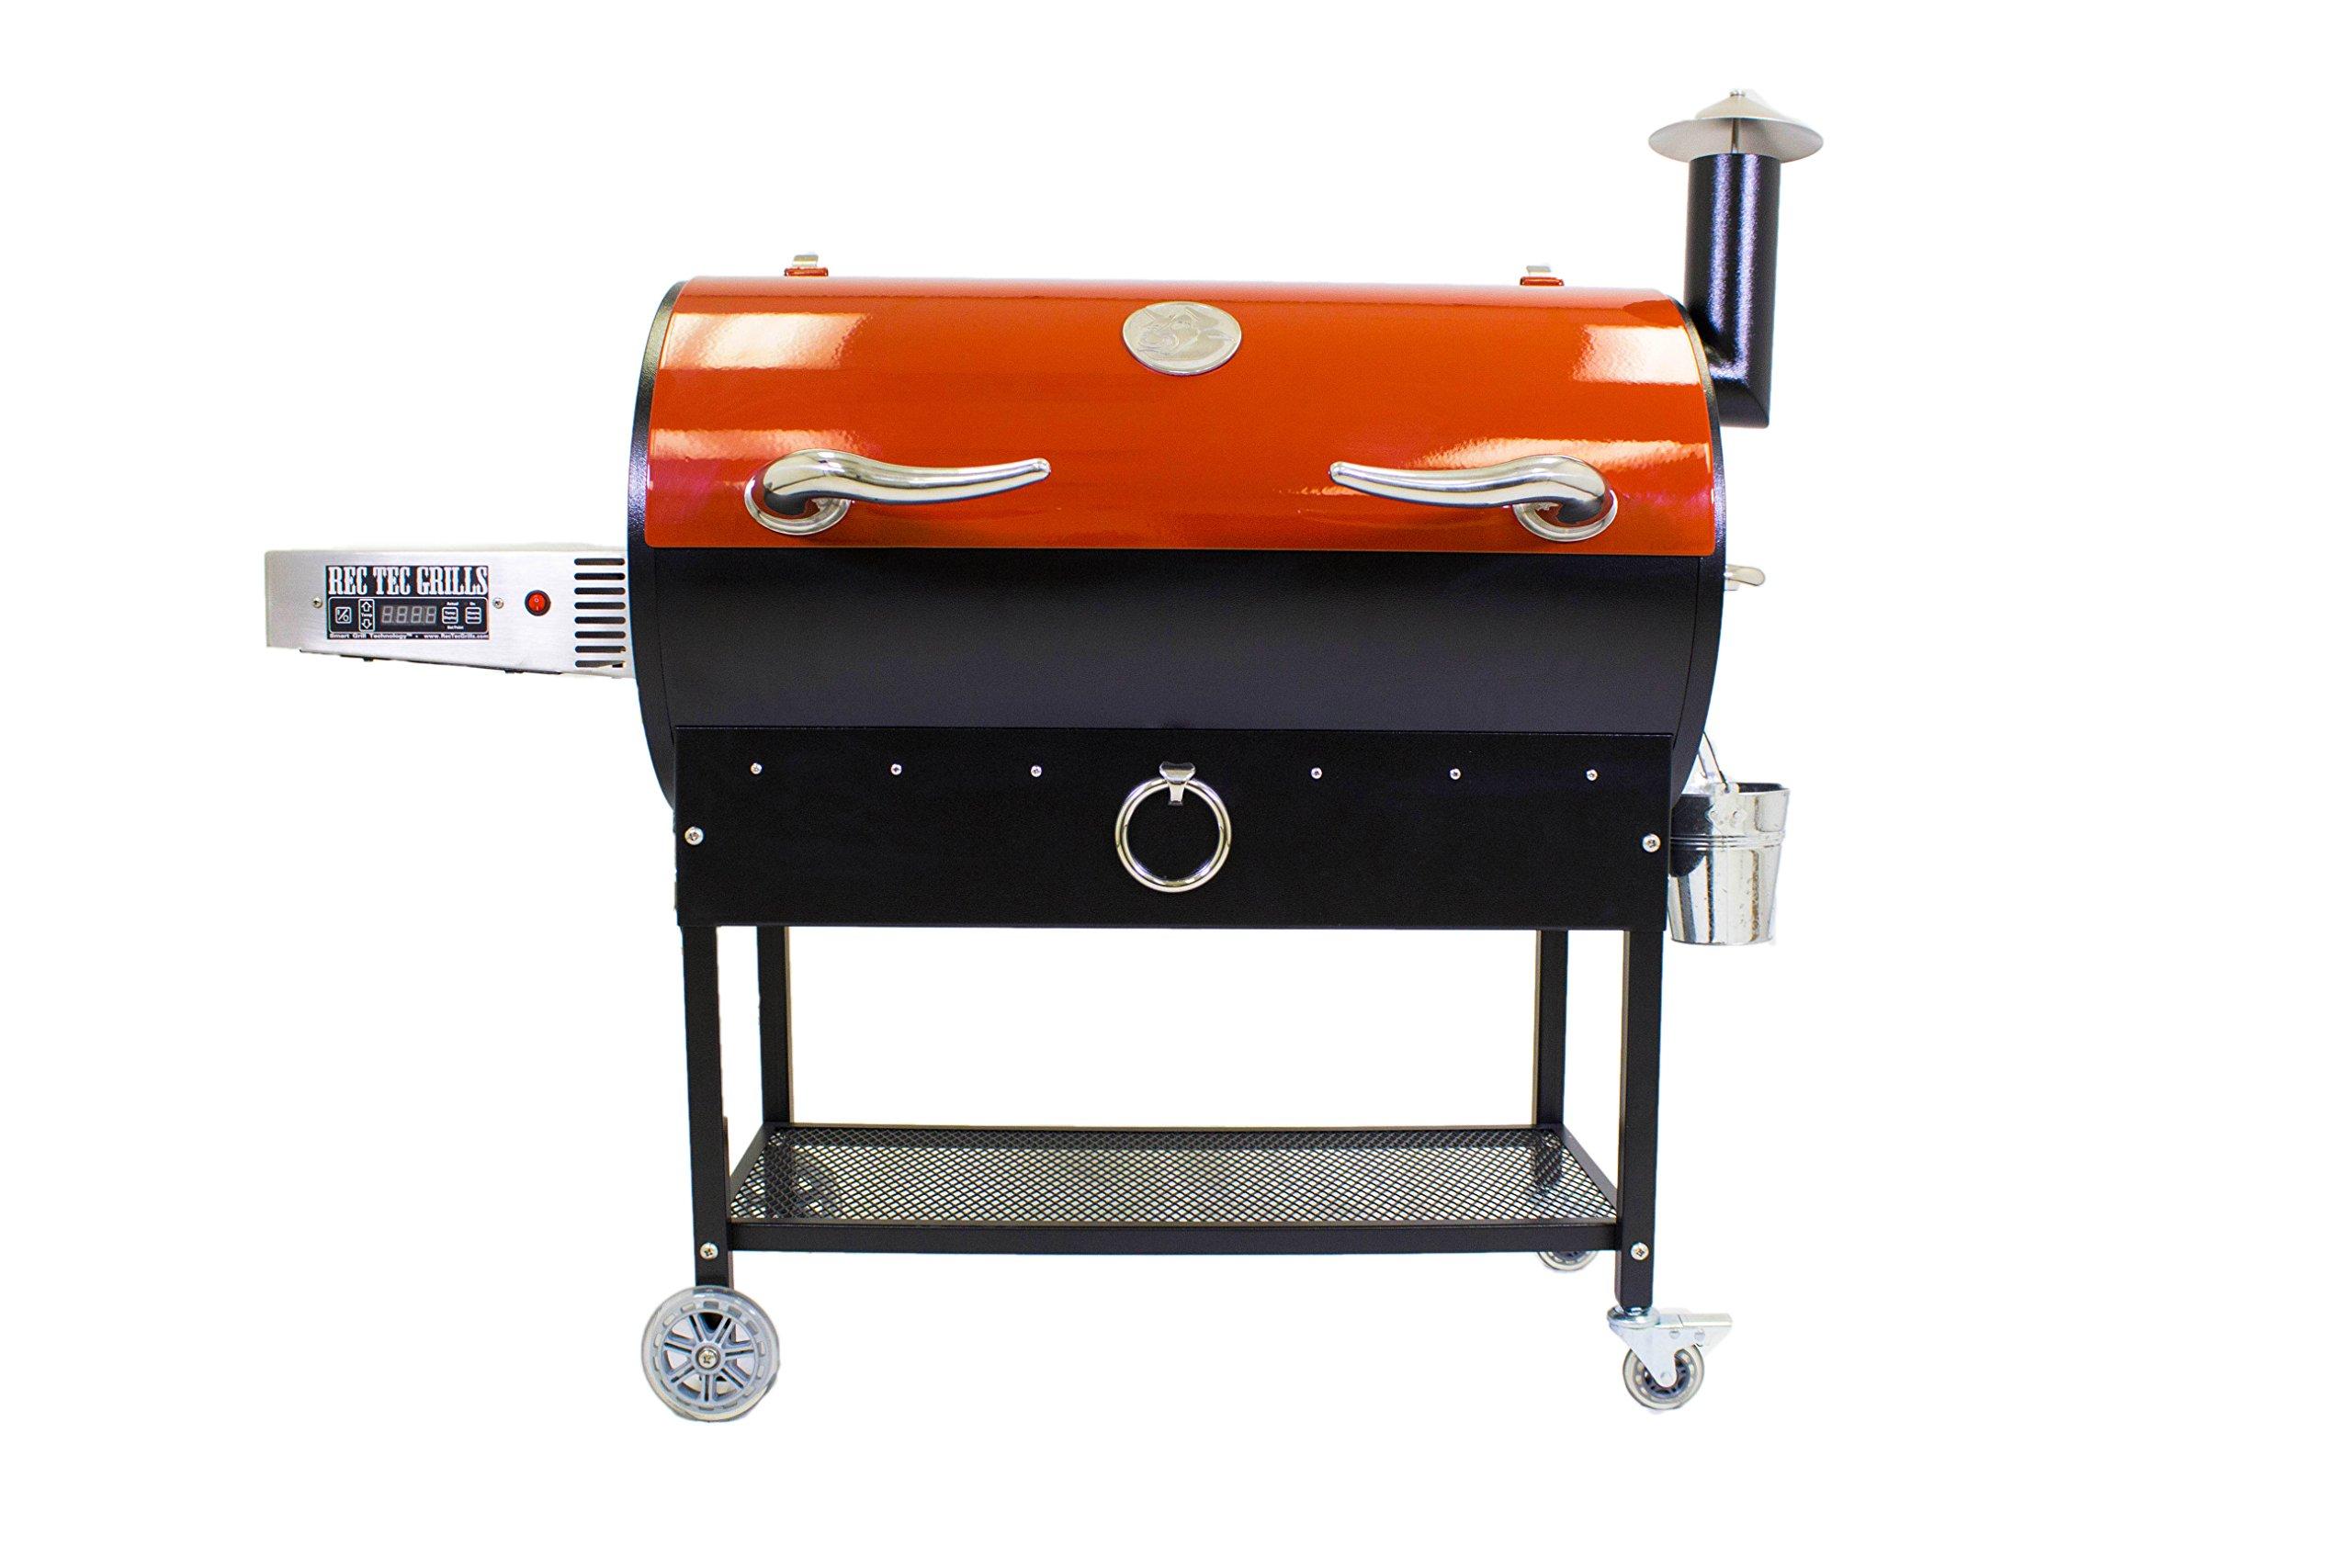 REC TEC Wood Pellet Grill - Featuring Smart Grill Technology™